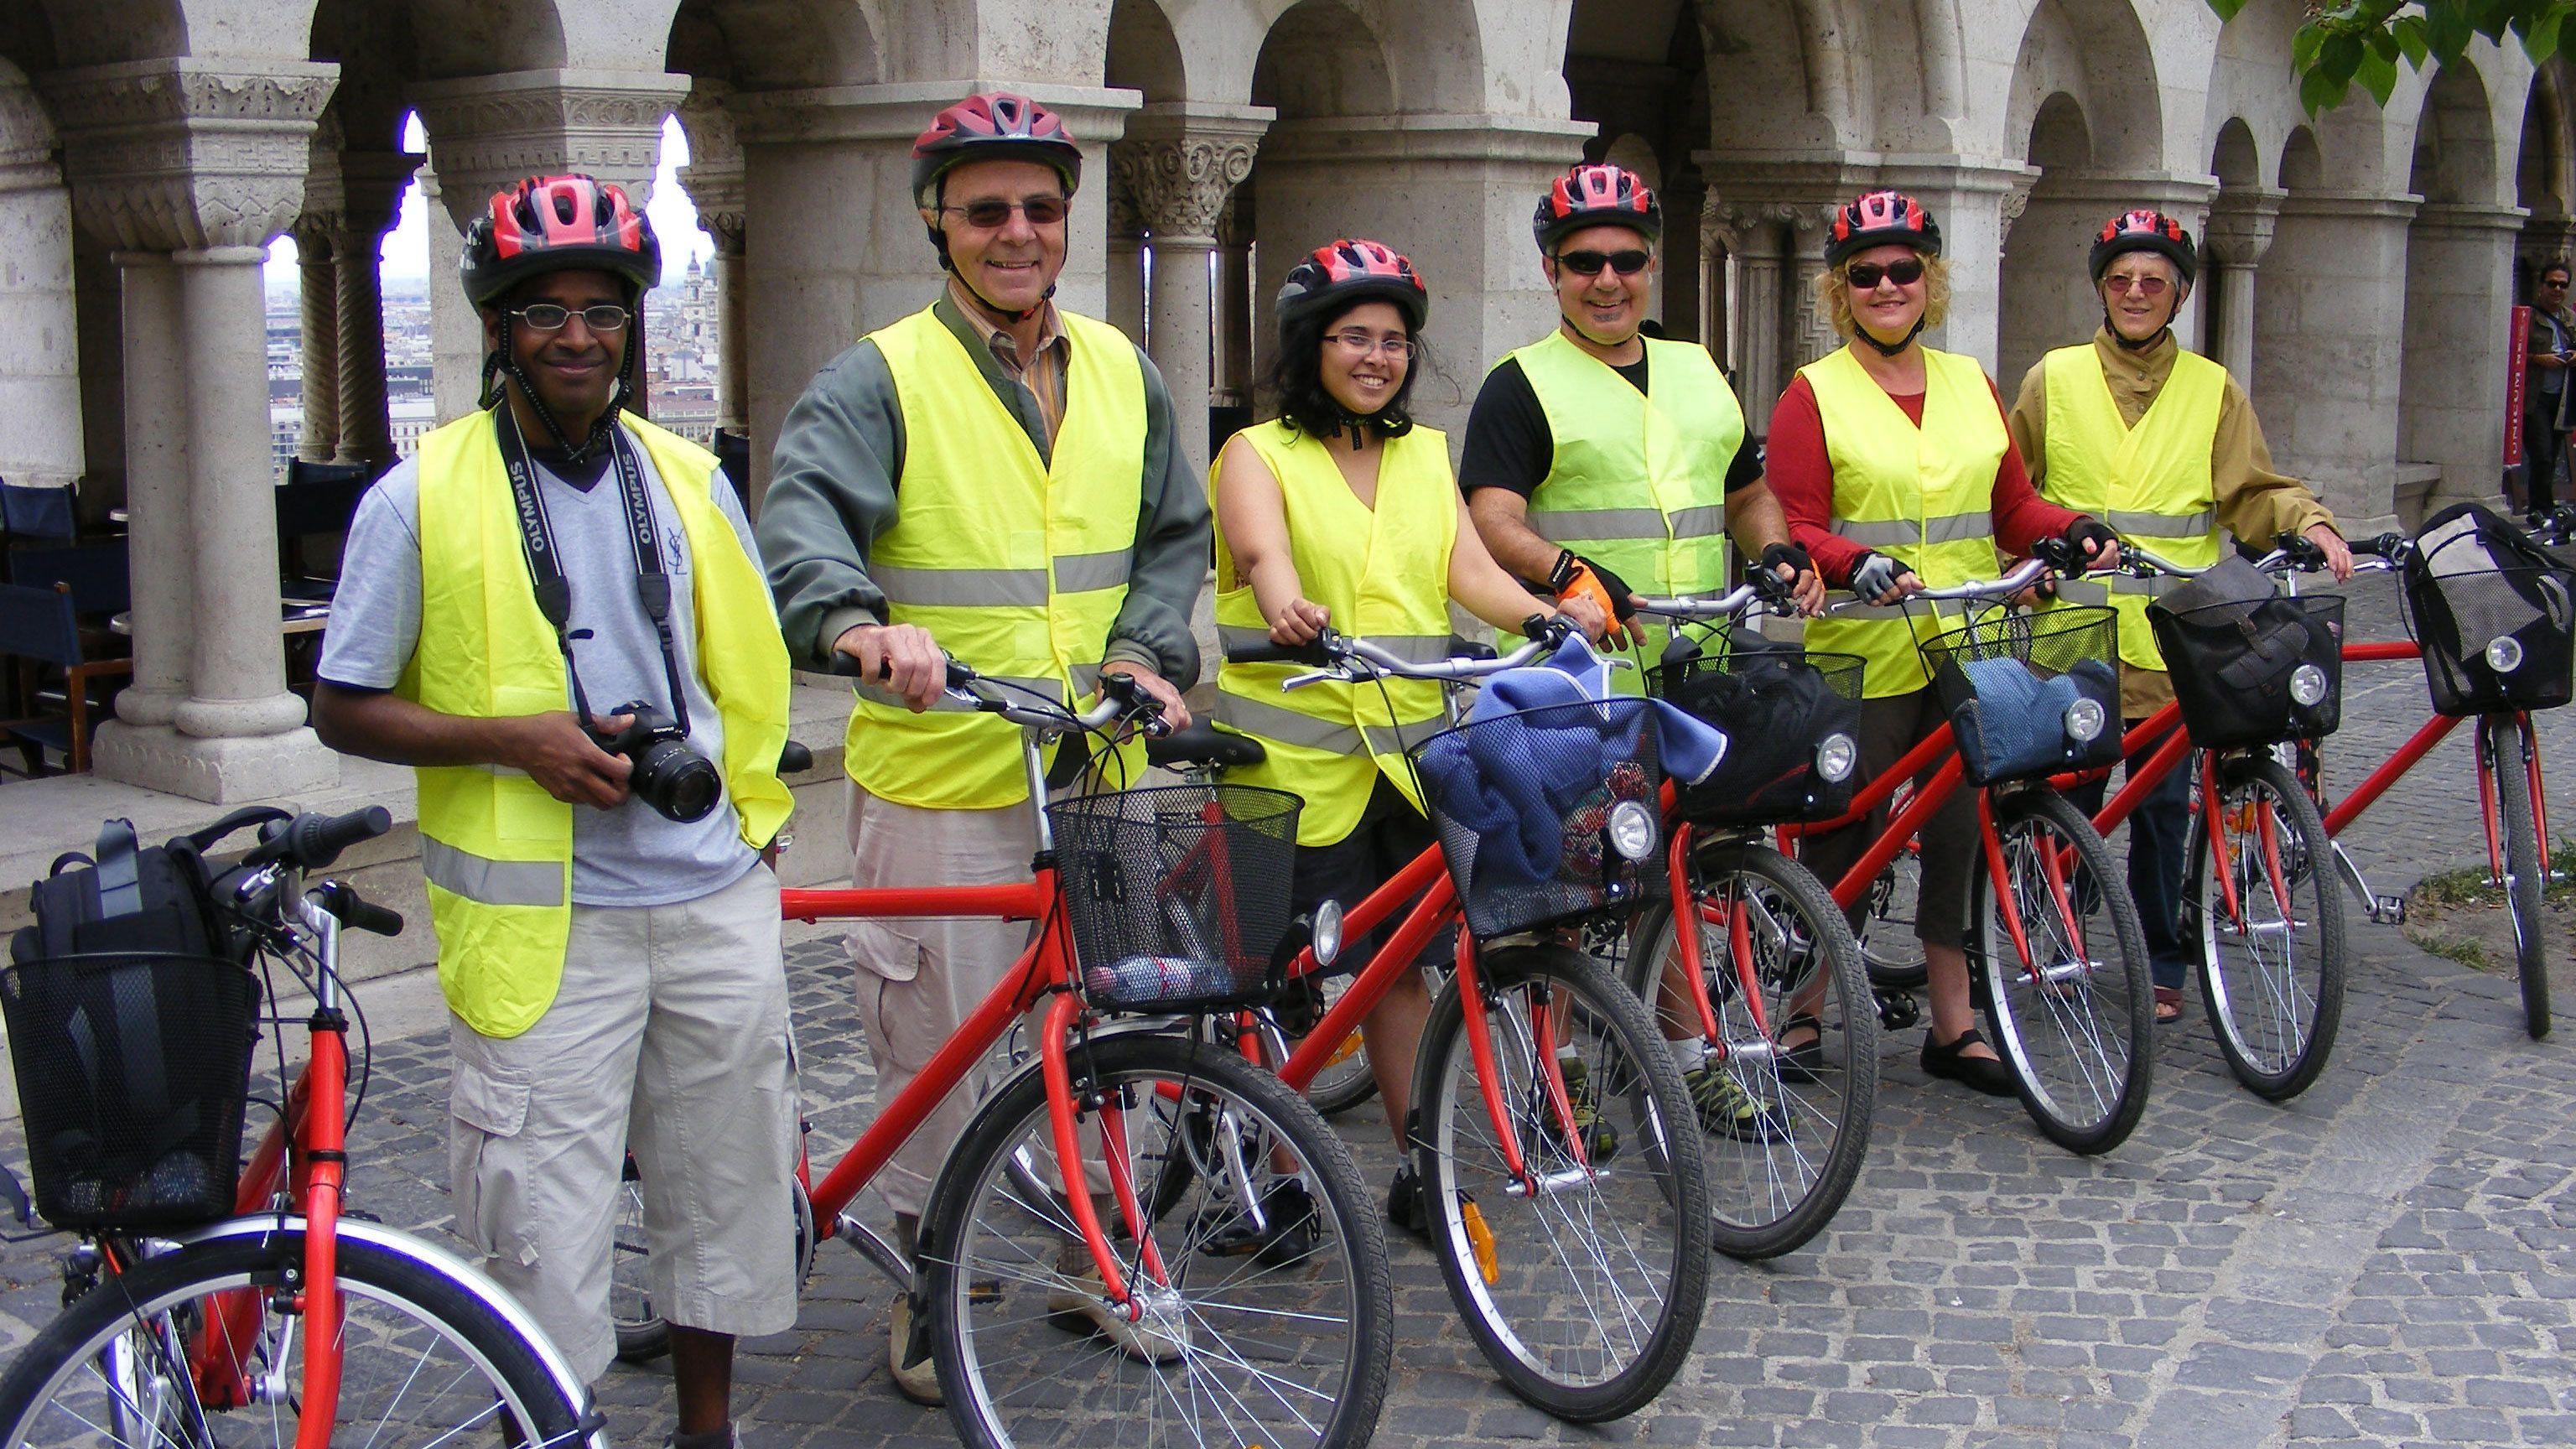 Tourists prepare to tour Budapest on bike